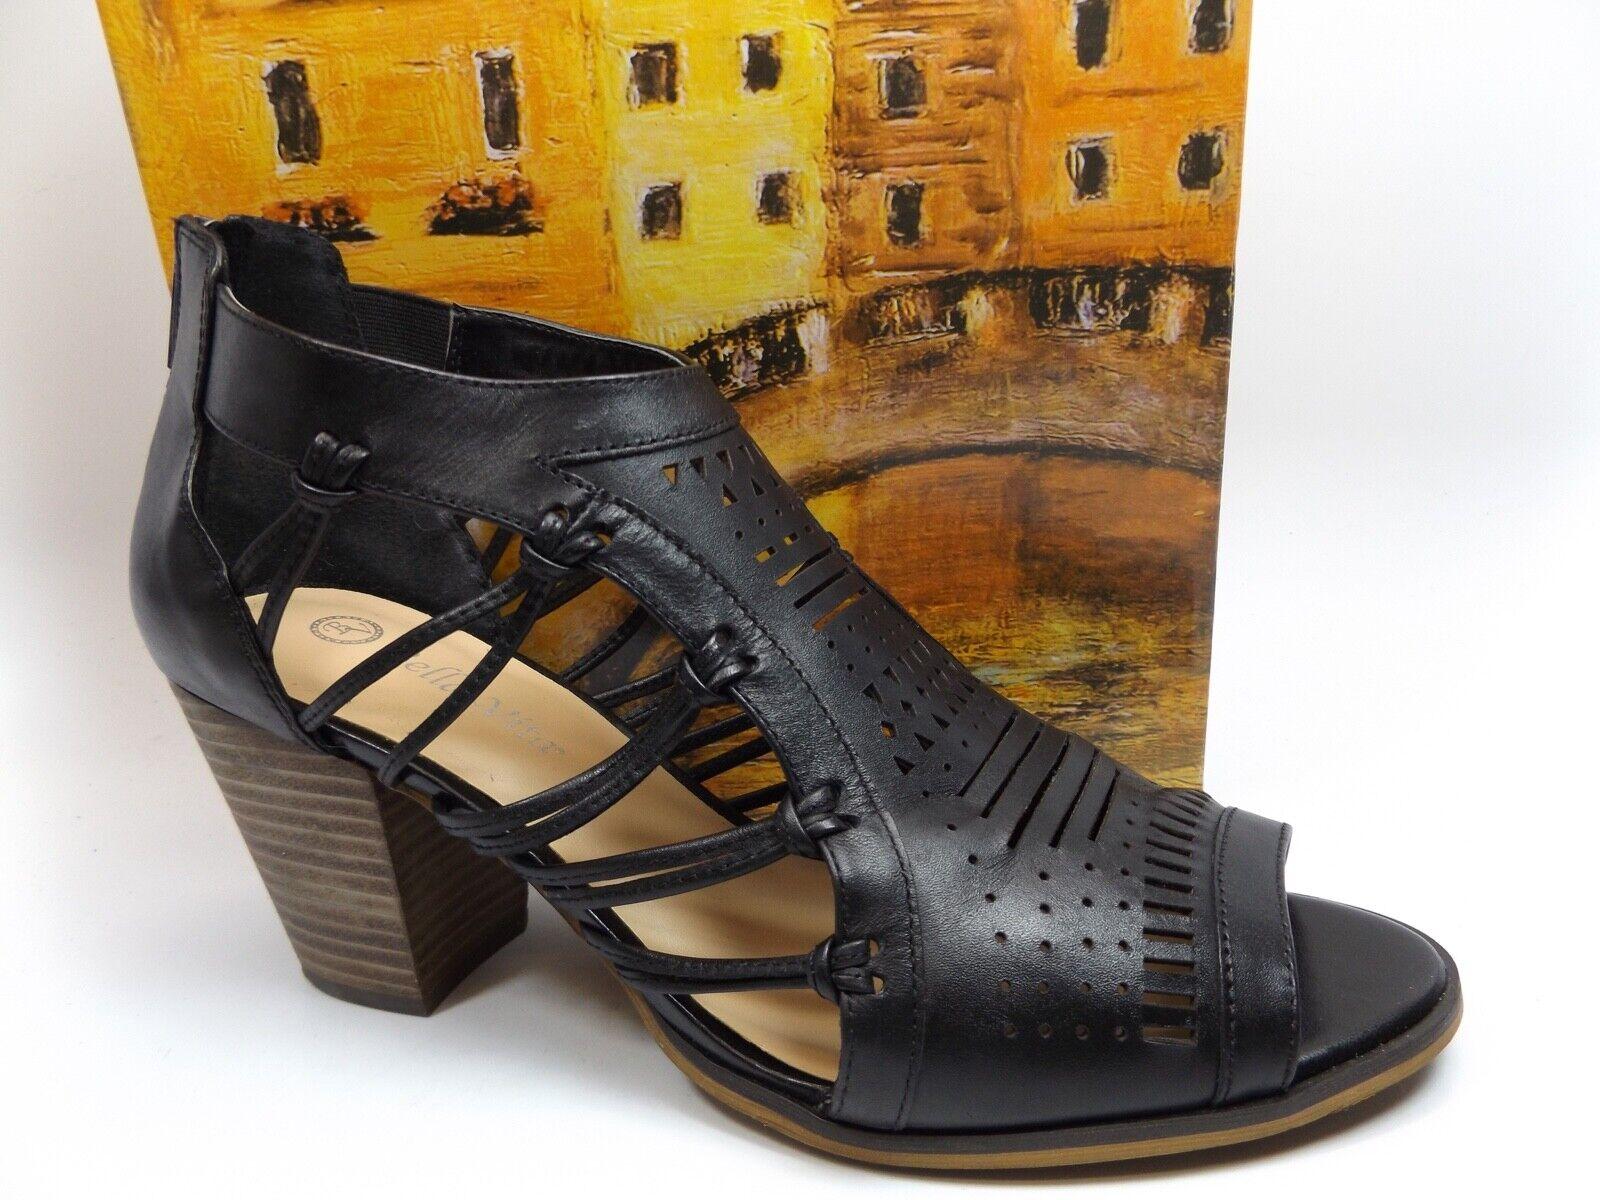 Bella Vita Kortez Block Heel Sandal Women's, SZ 11.0 WIDE, Black LEATHER, D10044